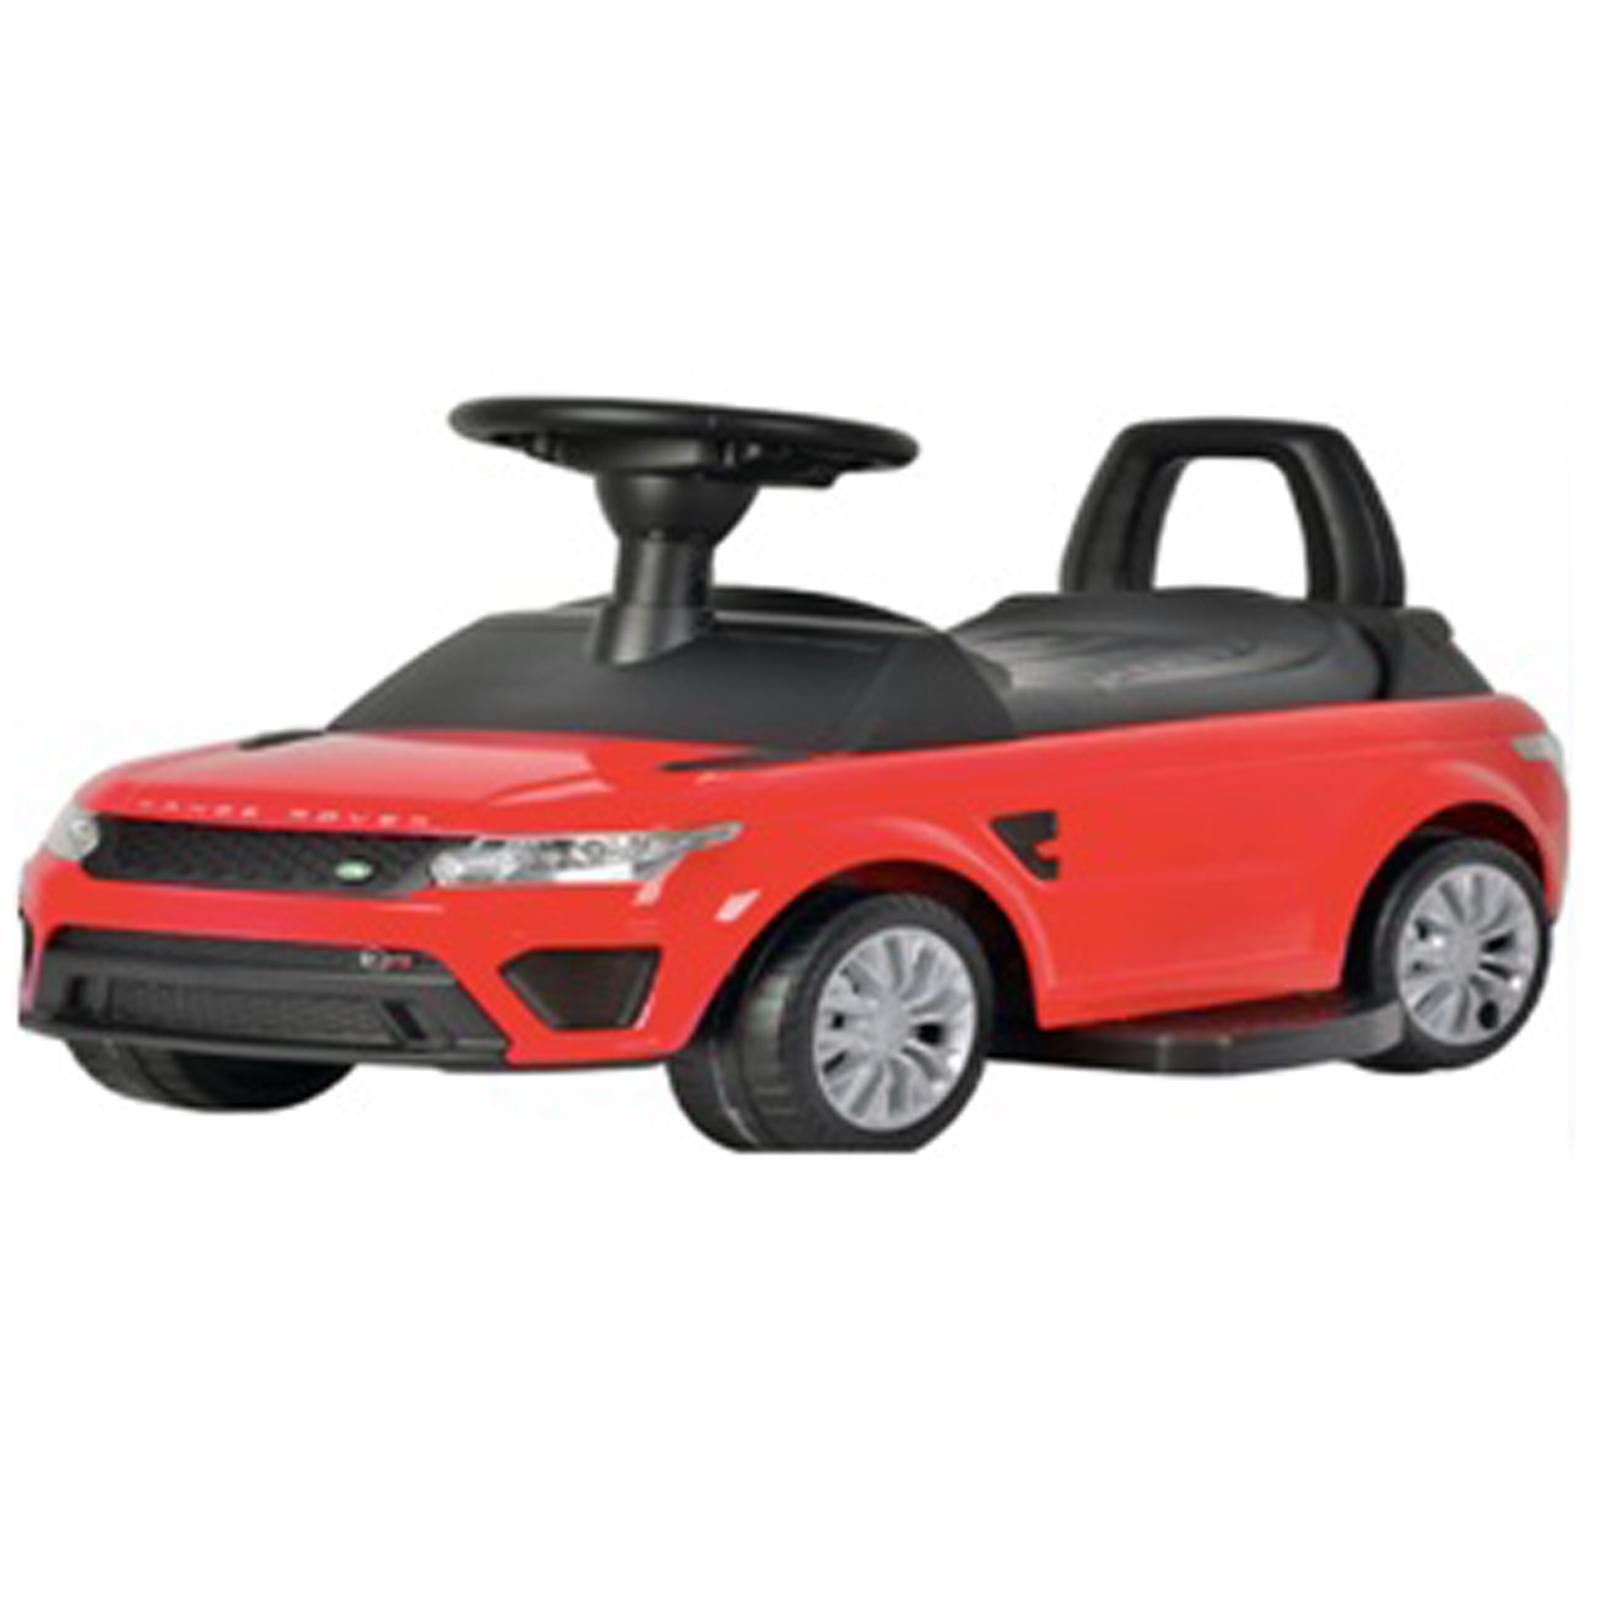 Licensed Range Rover Sport SVR Kids Ride On Car Battery Powered 6V - Red